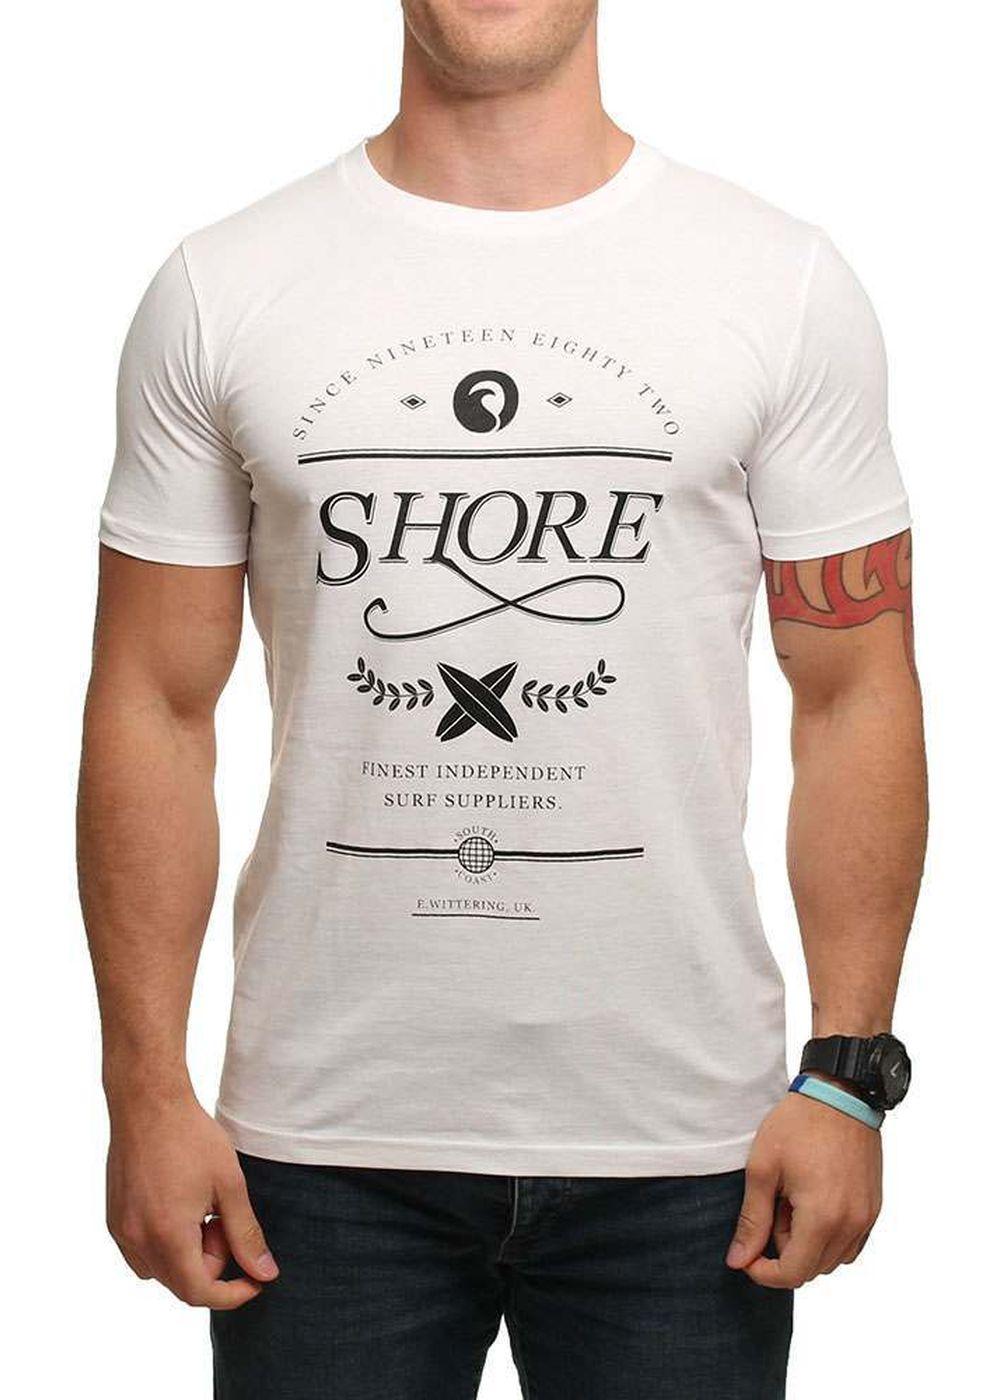 http://www.shore.co.uk/media/catalog/product/S/H/SHCLASWTa.jpg